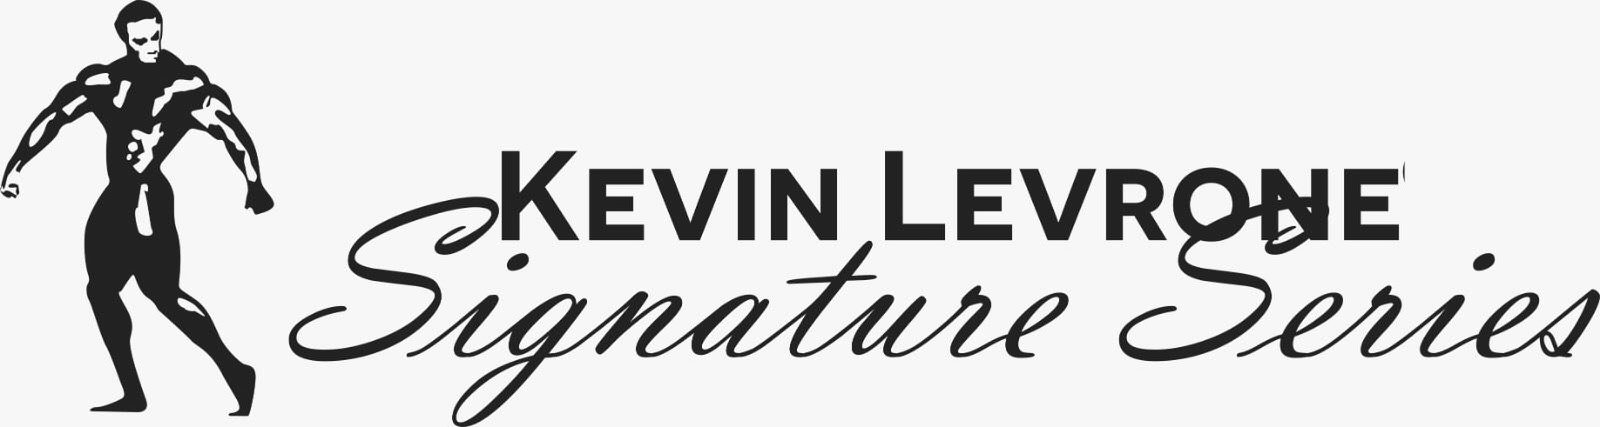 KEVIN LEVRONE SIGNATURE SERIES - Levrone Global, LLC Trademark Registration